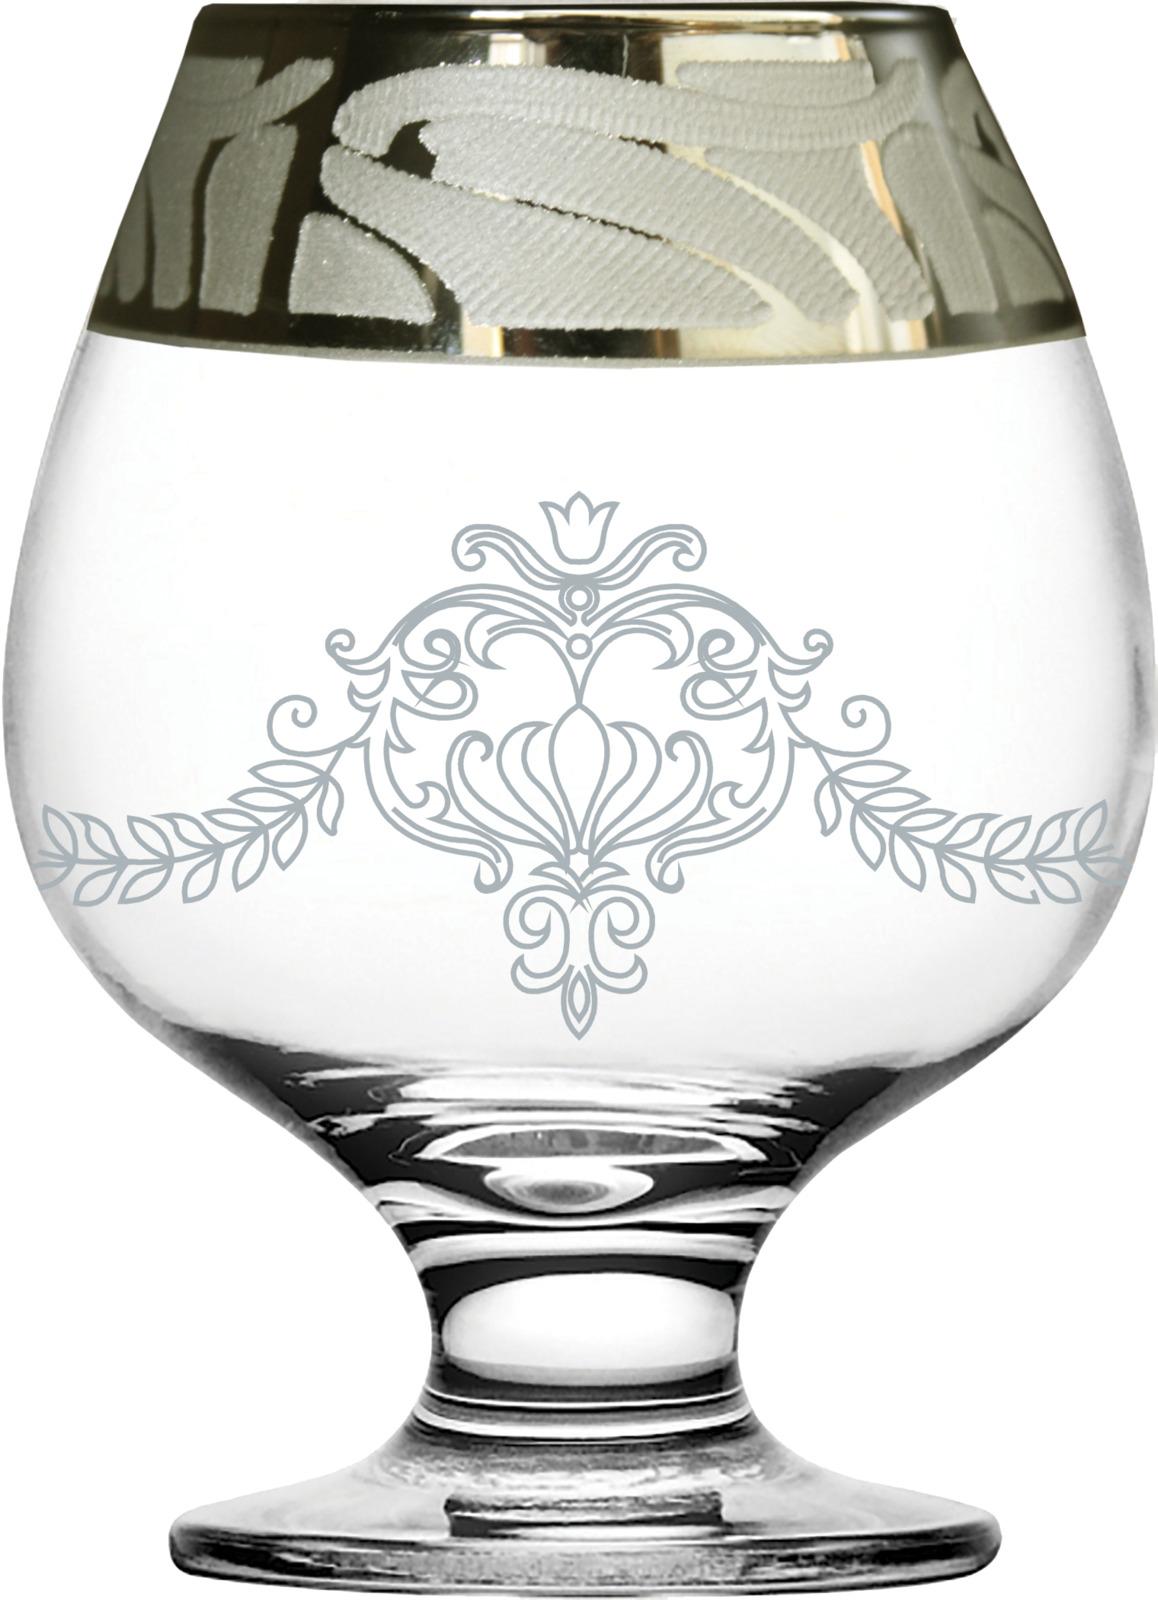 Набор бокалов для бренди Гусь-Хрустальный Мускат, GE05-188, 400 мл, 6 шт набор бокалов гусь хрустальный золотой карат